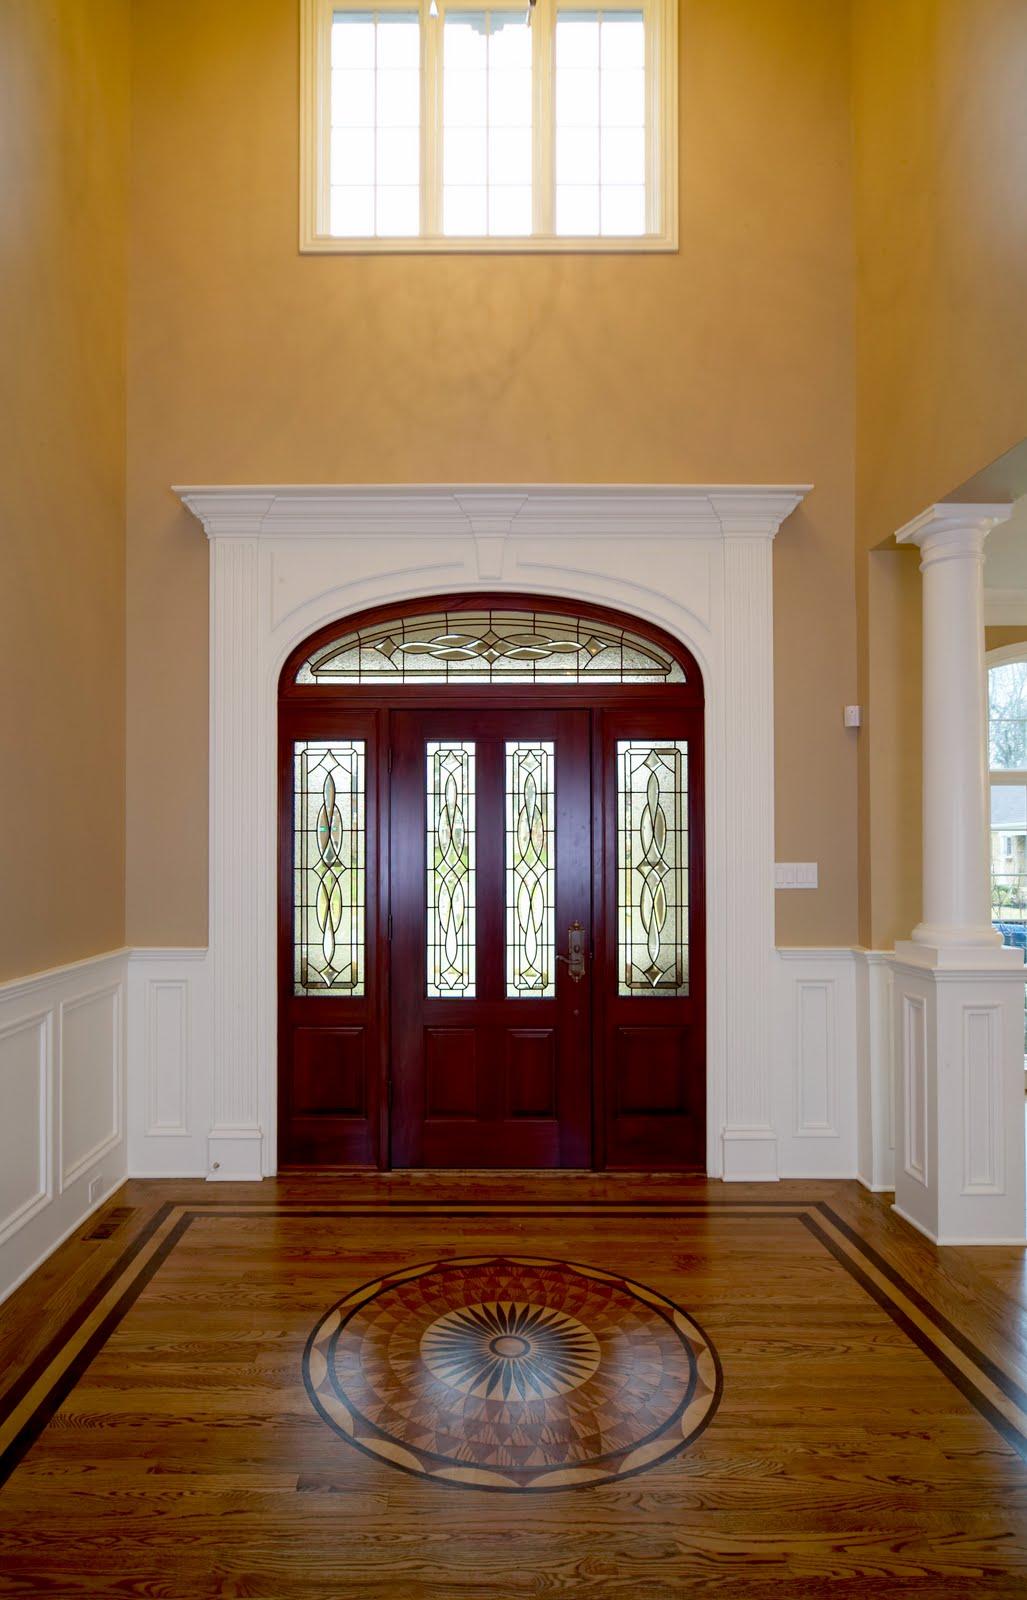 Miraculous Design Dump Nice And Trim Remodelaholic Guest Post Door Handles Collection Dhjemzonderlifede